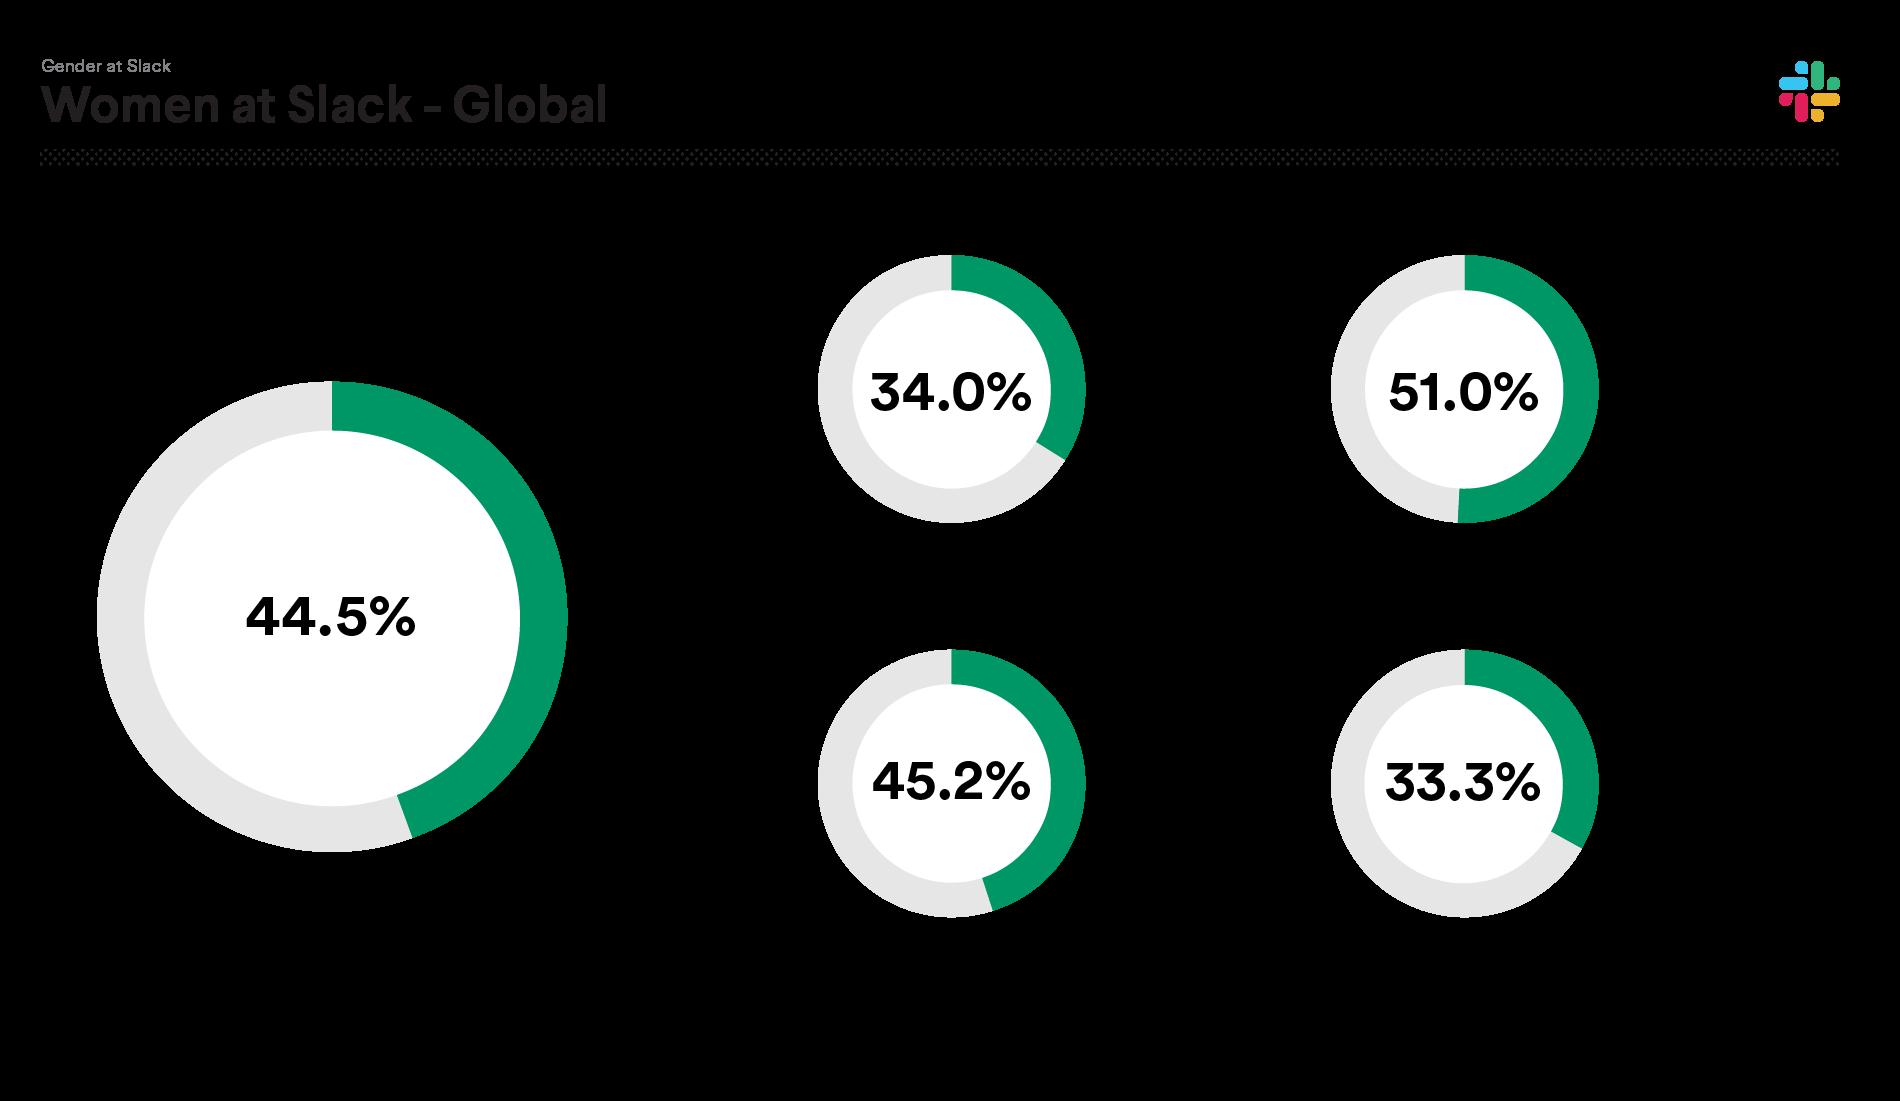 2020 data on women at Slack: Total women 44.5%; Technical 34.0%; Non-Technical 51.0%; Management 45.2%; Leadership 33.3%